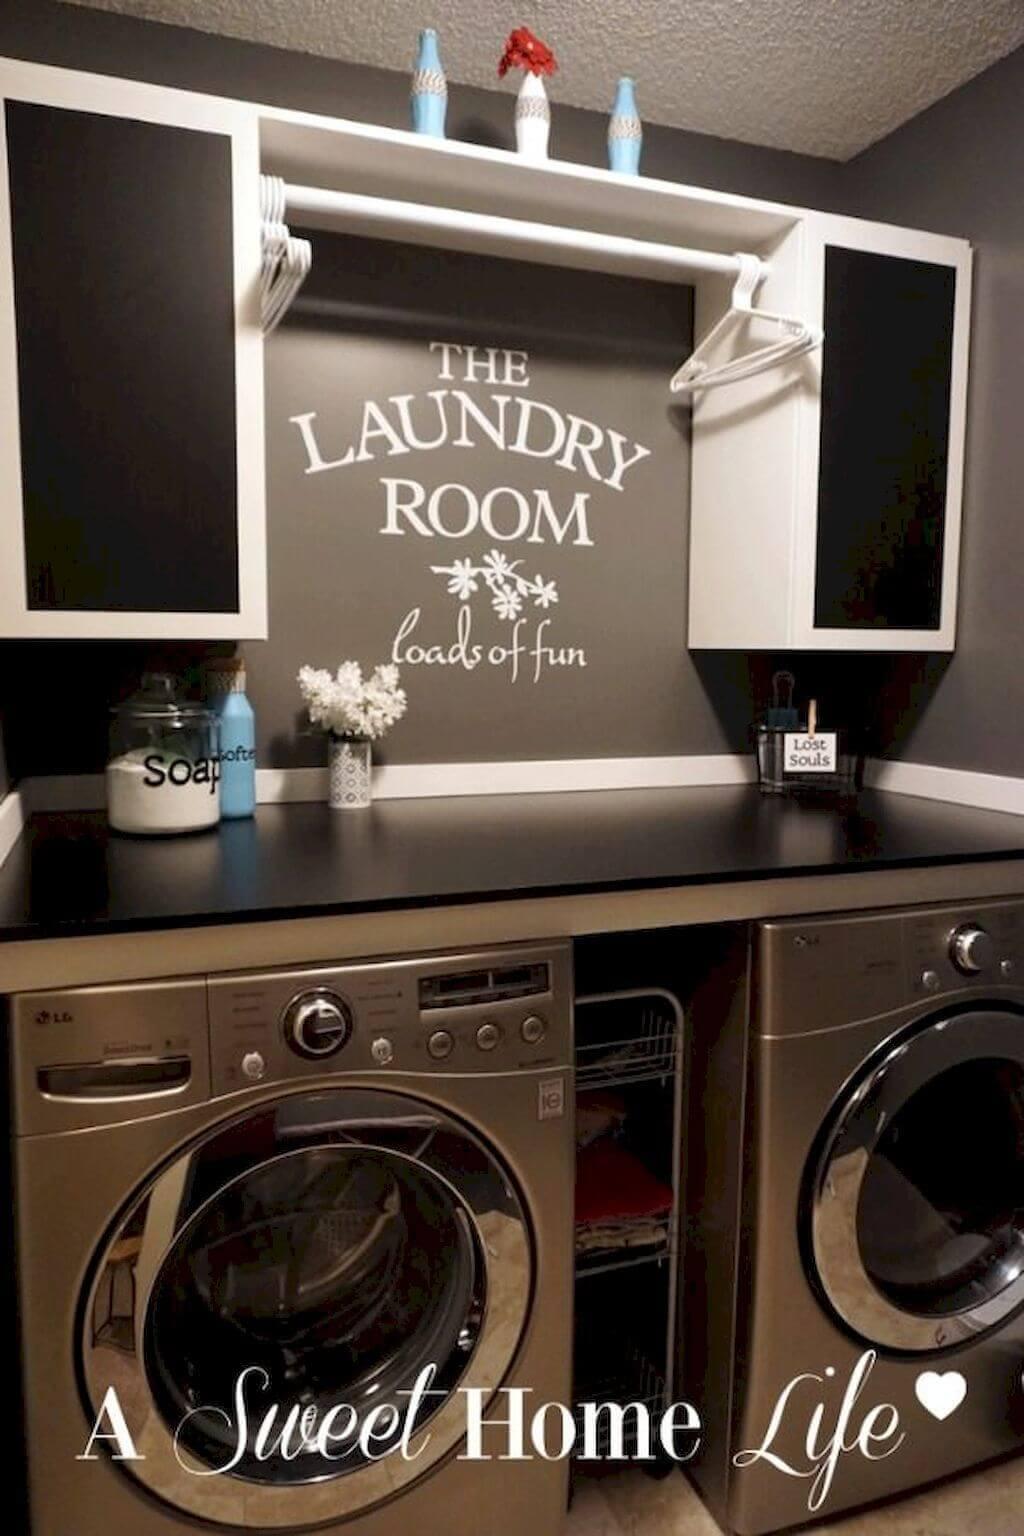 Best Small Laundry Room Ideas Organization - Harptimes.com